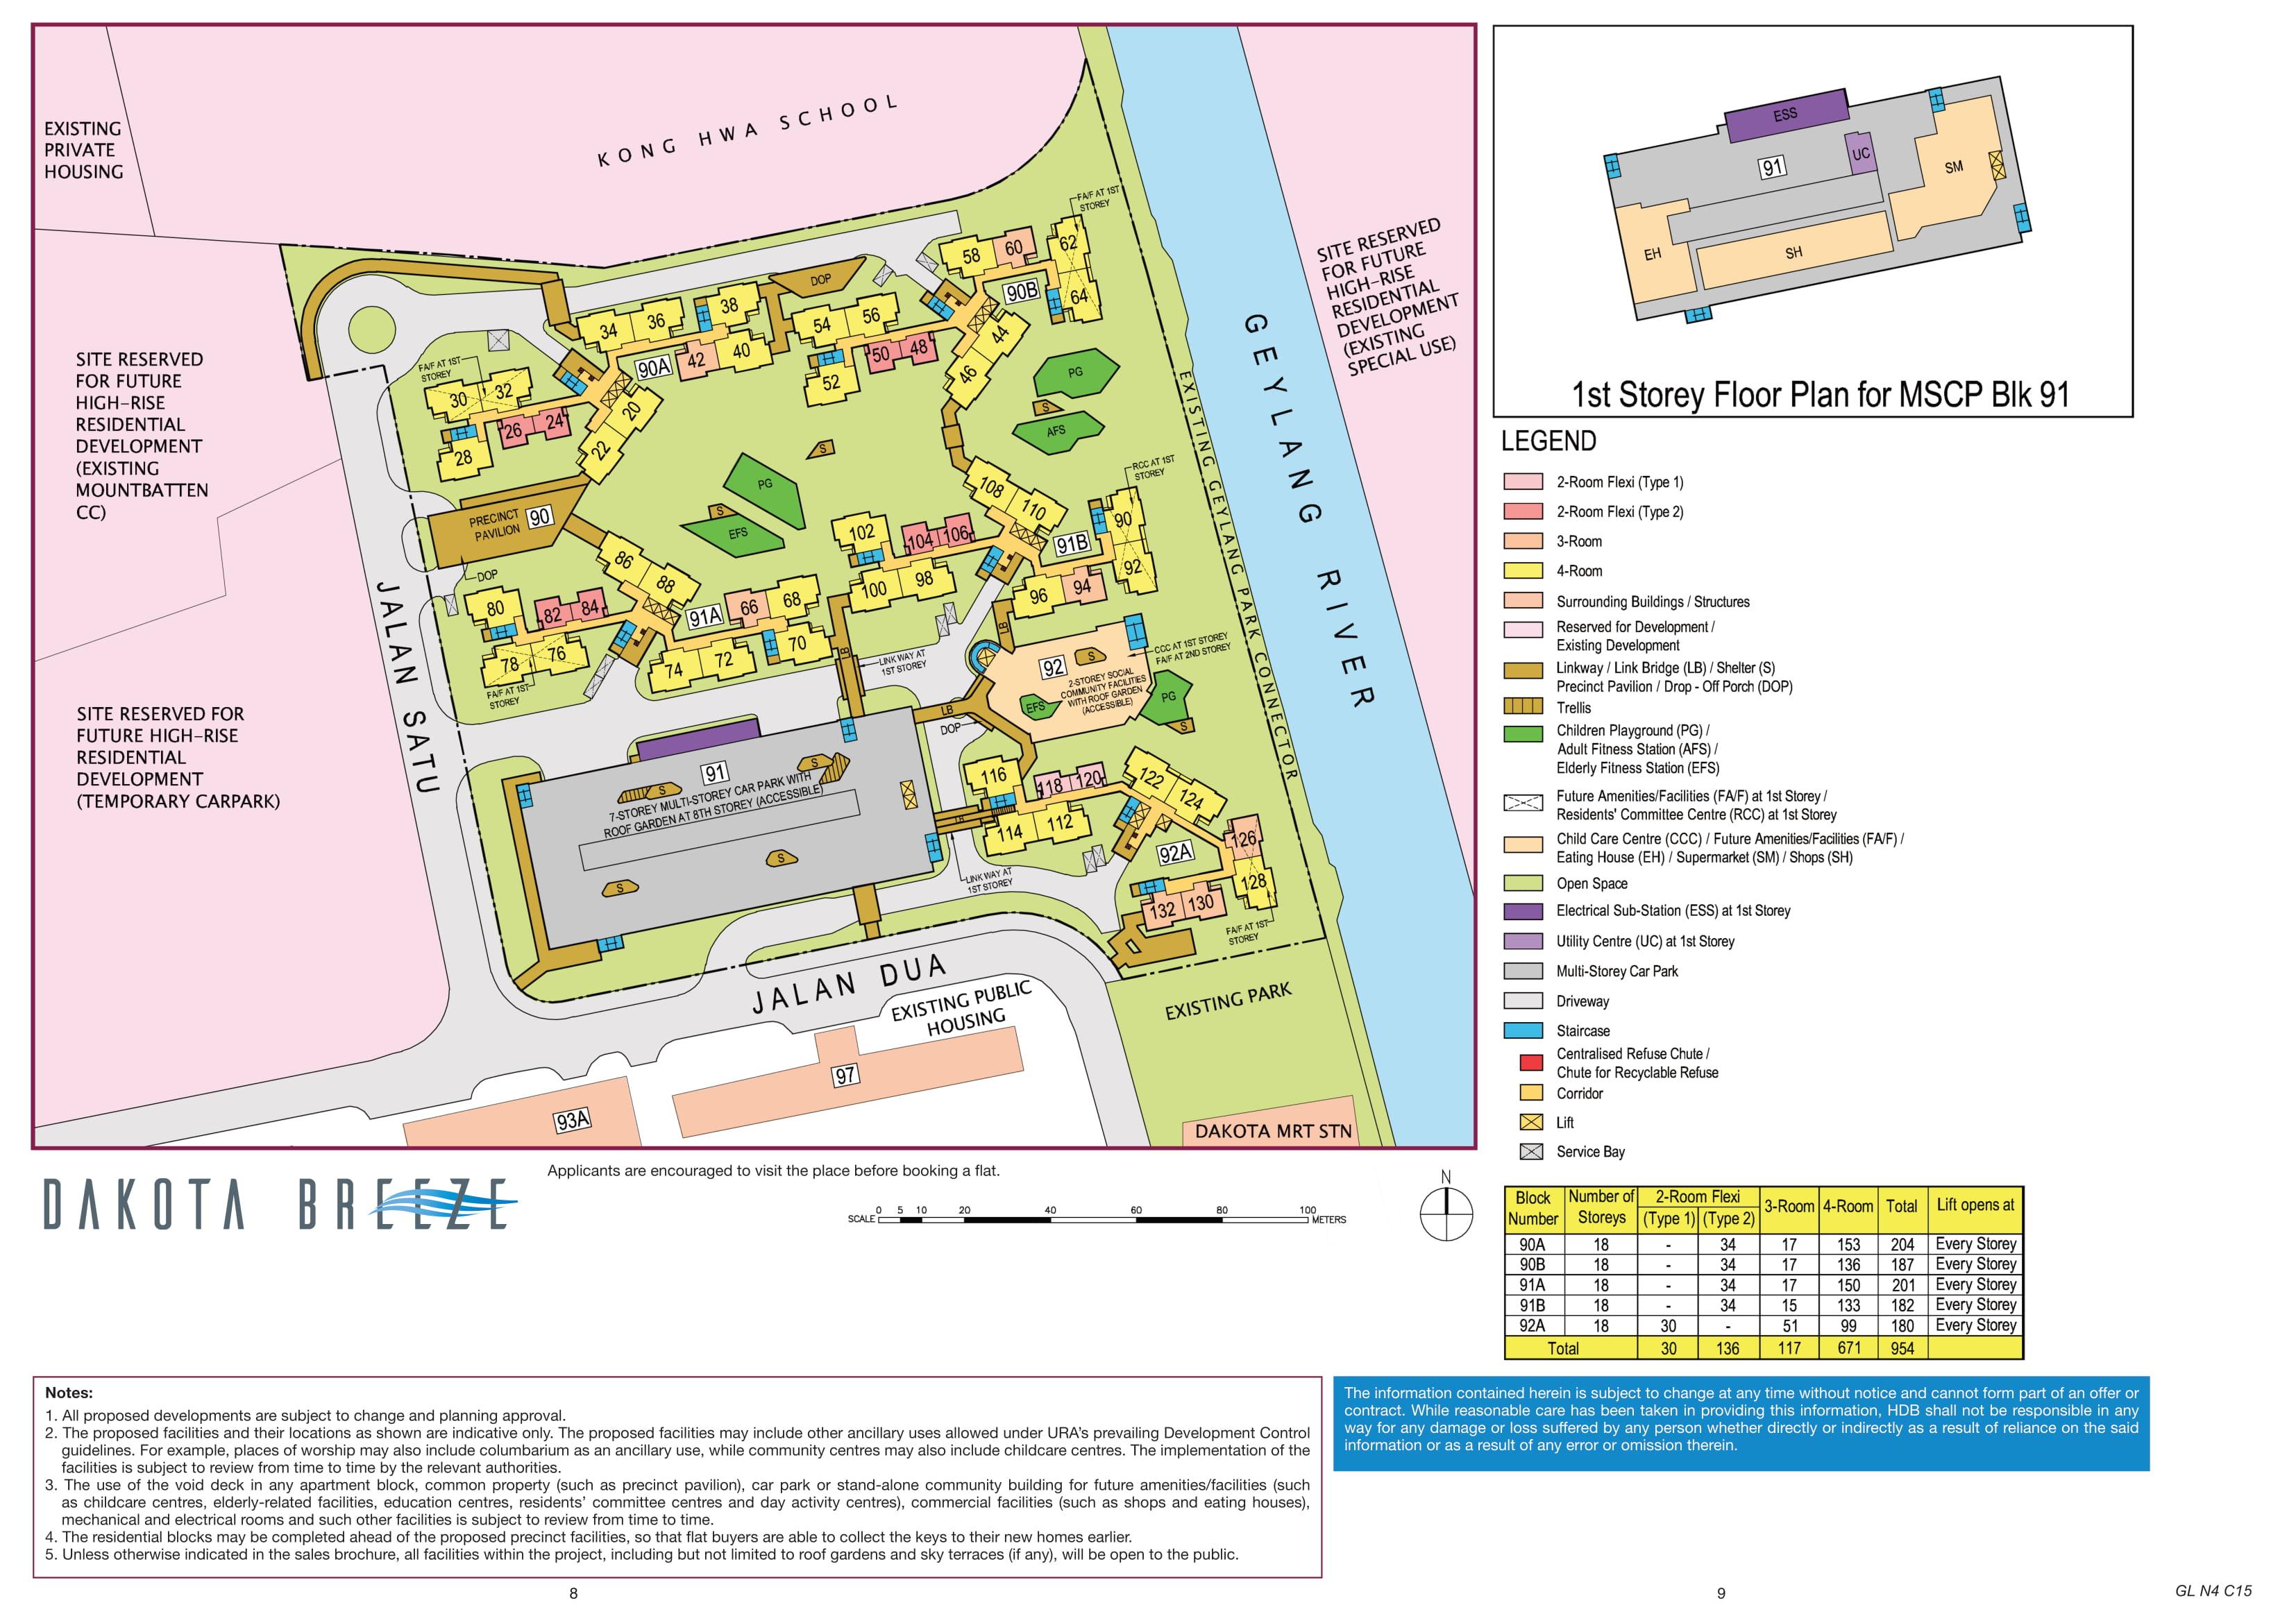 Dakota Breeze Site Plan